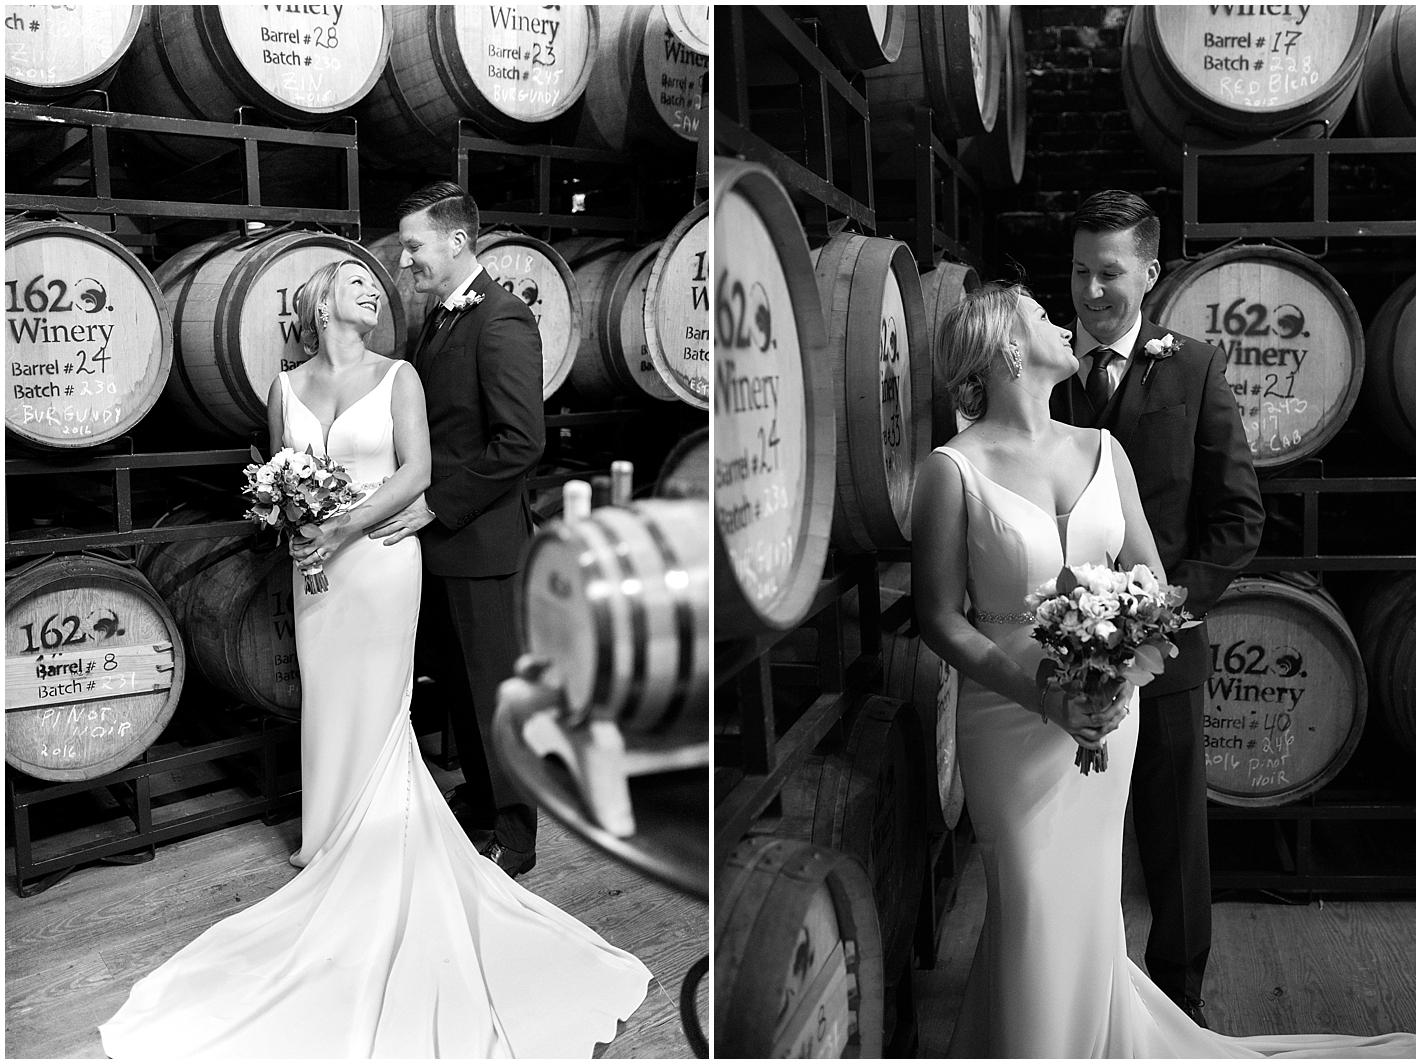 Wine barrel Wedding Portrait by Alyssa Parker Photography